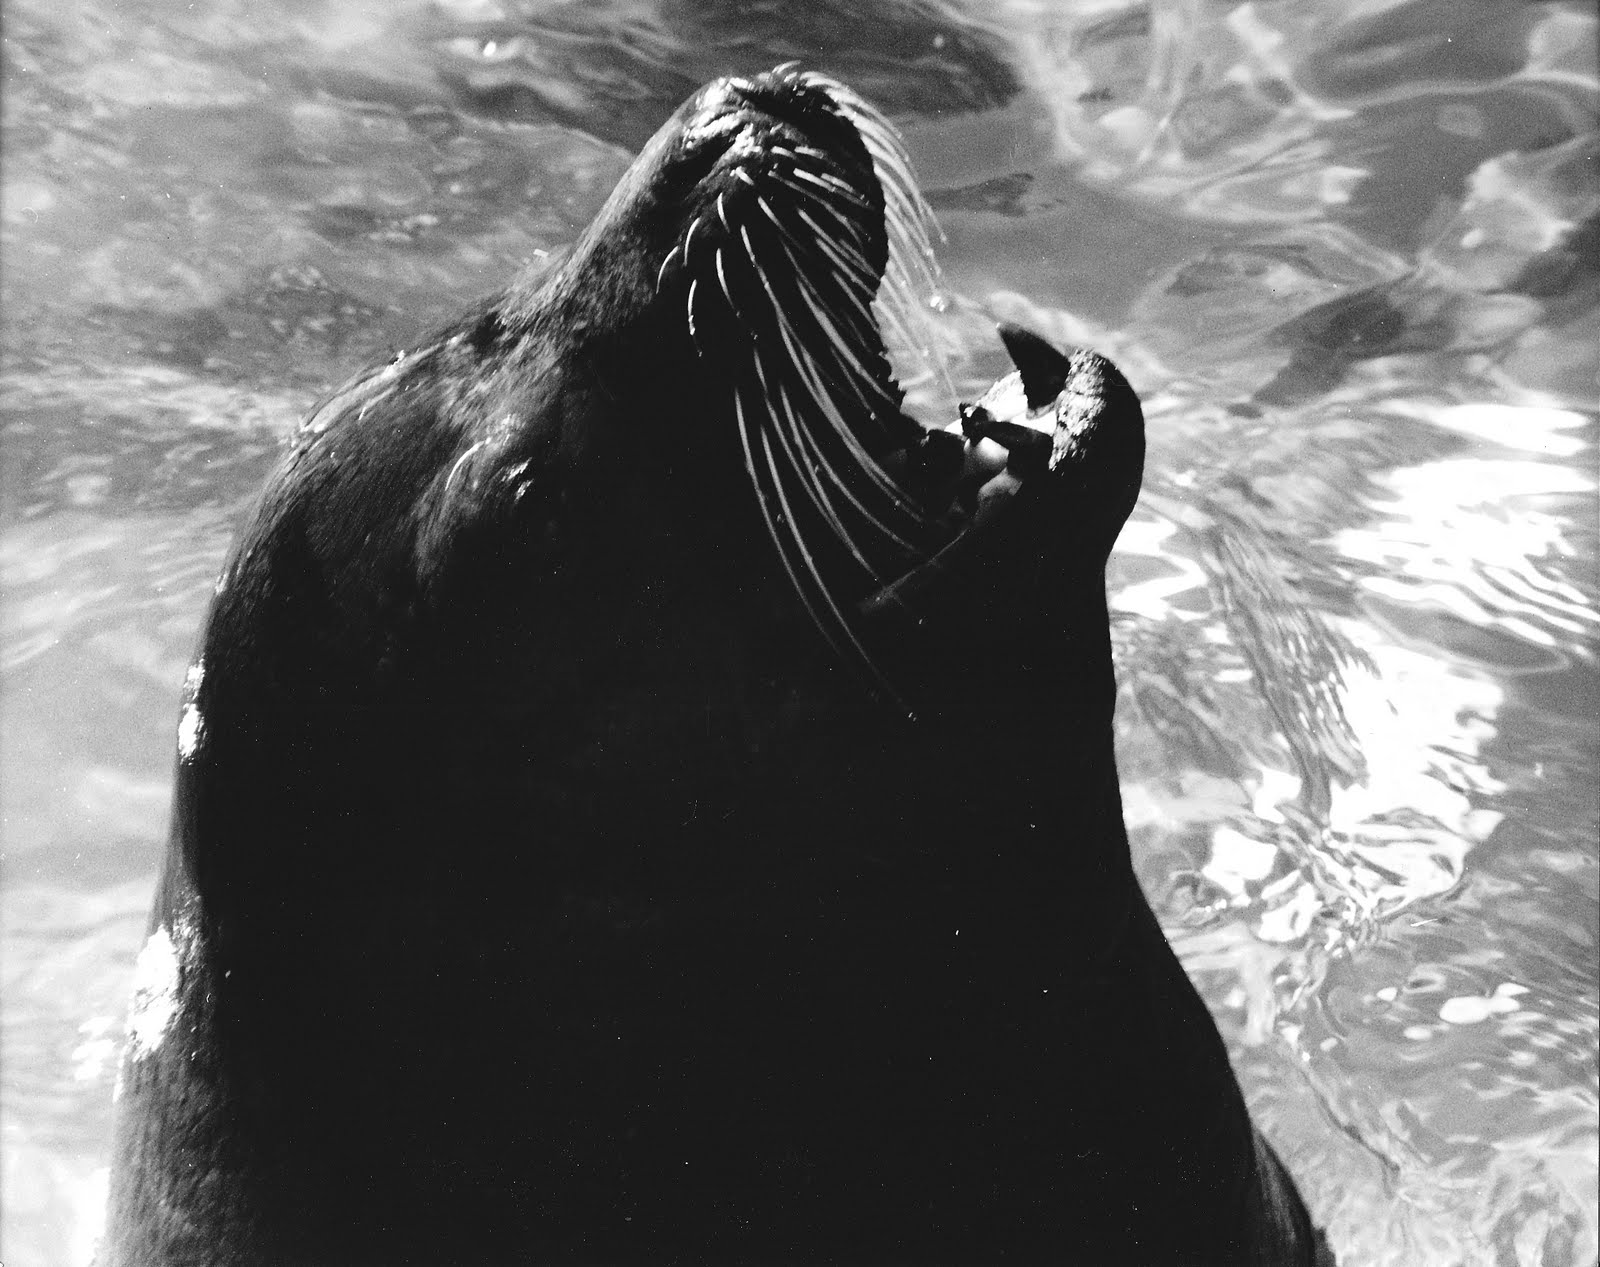 GordonGrice.com: Horrified mum watches sea lion attack boy ...